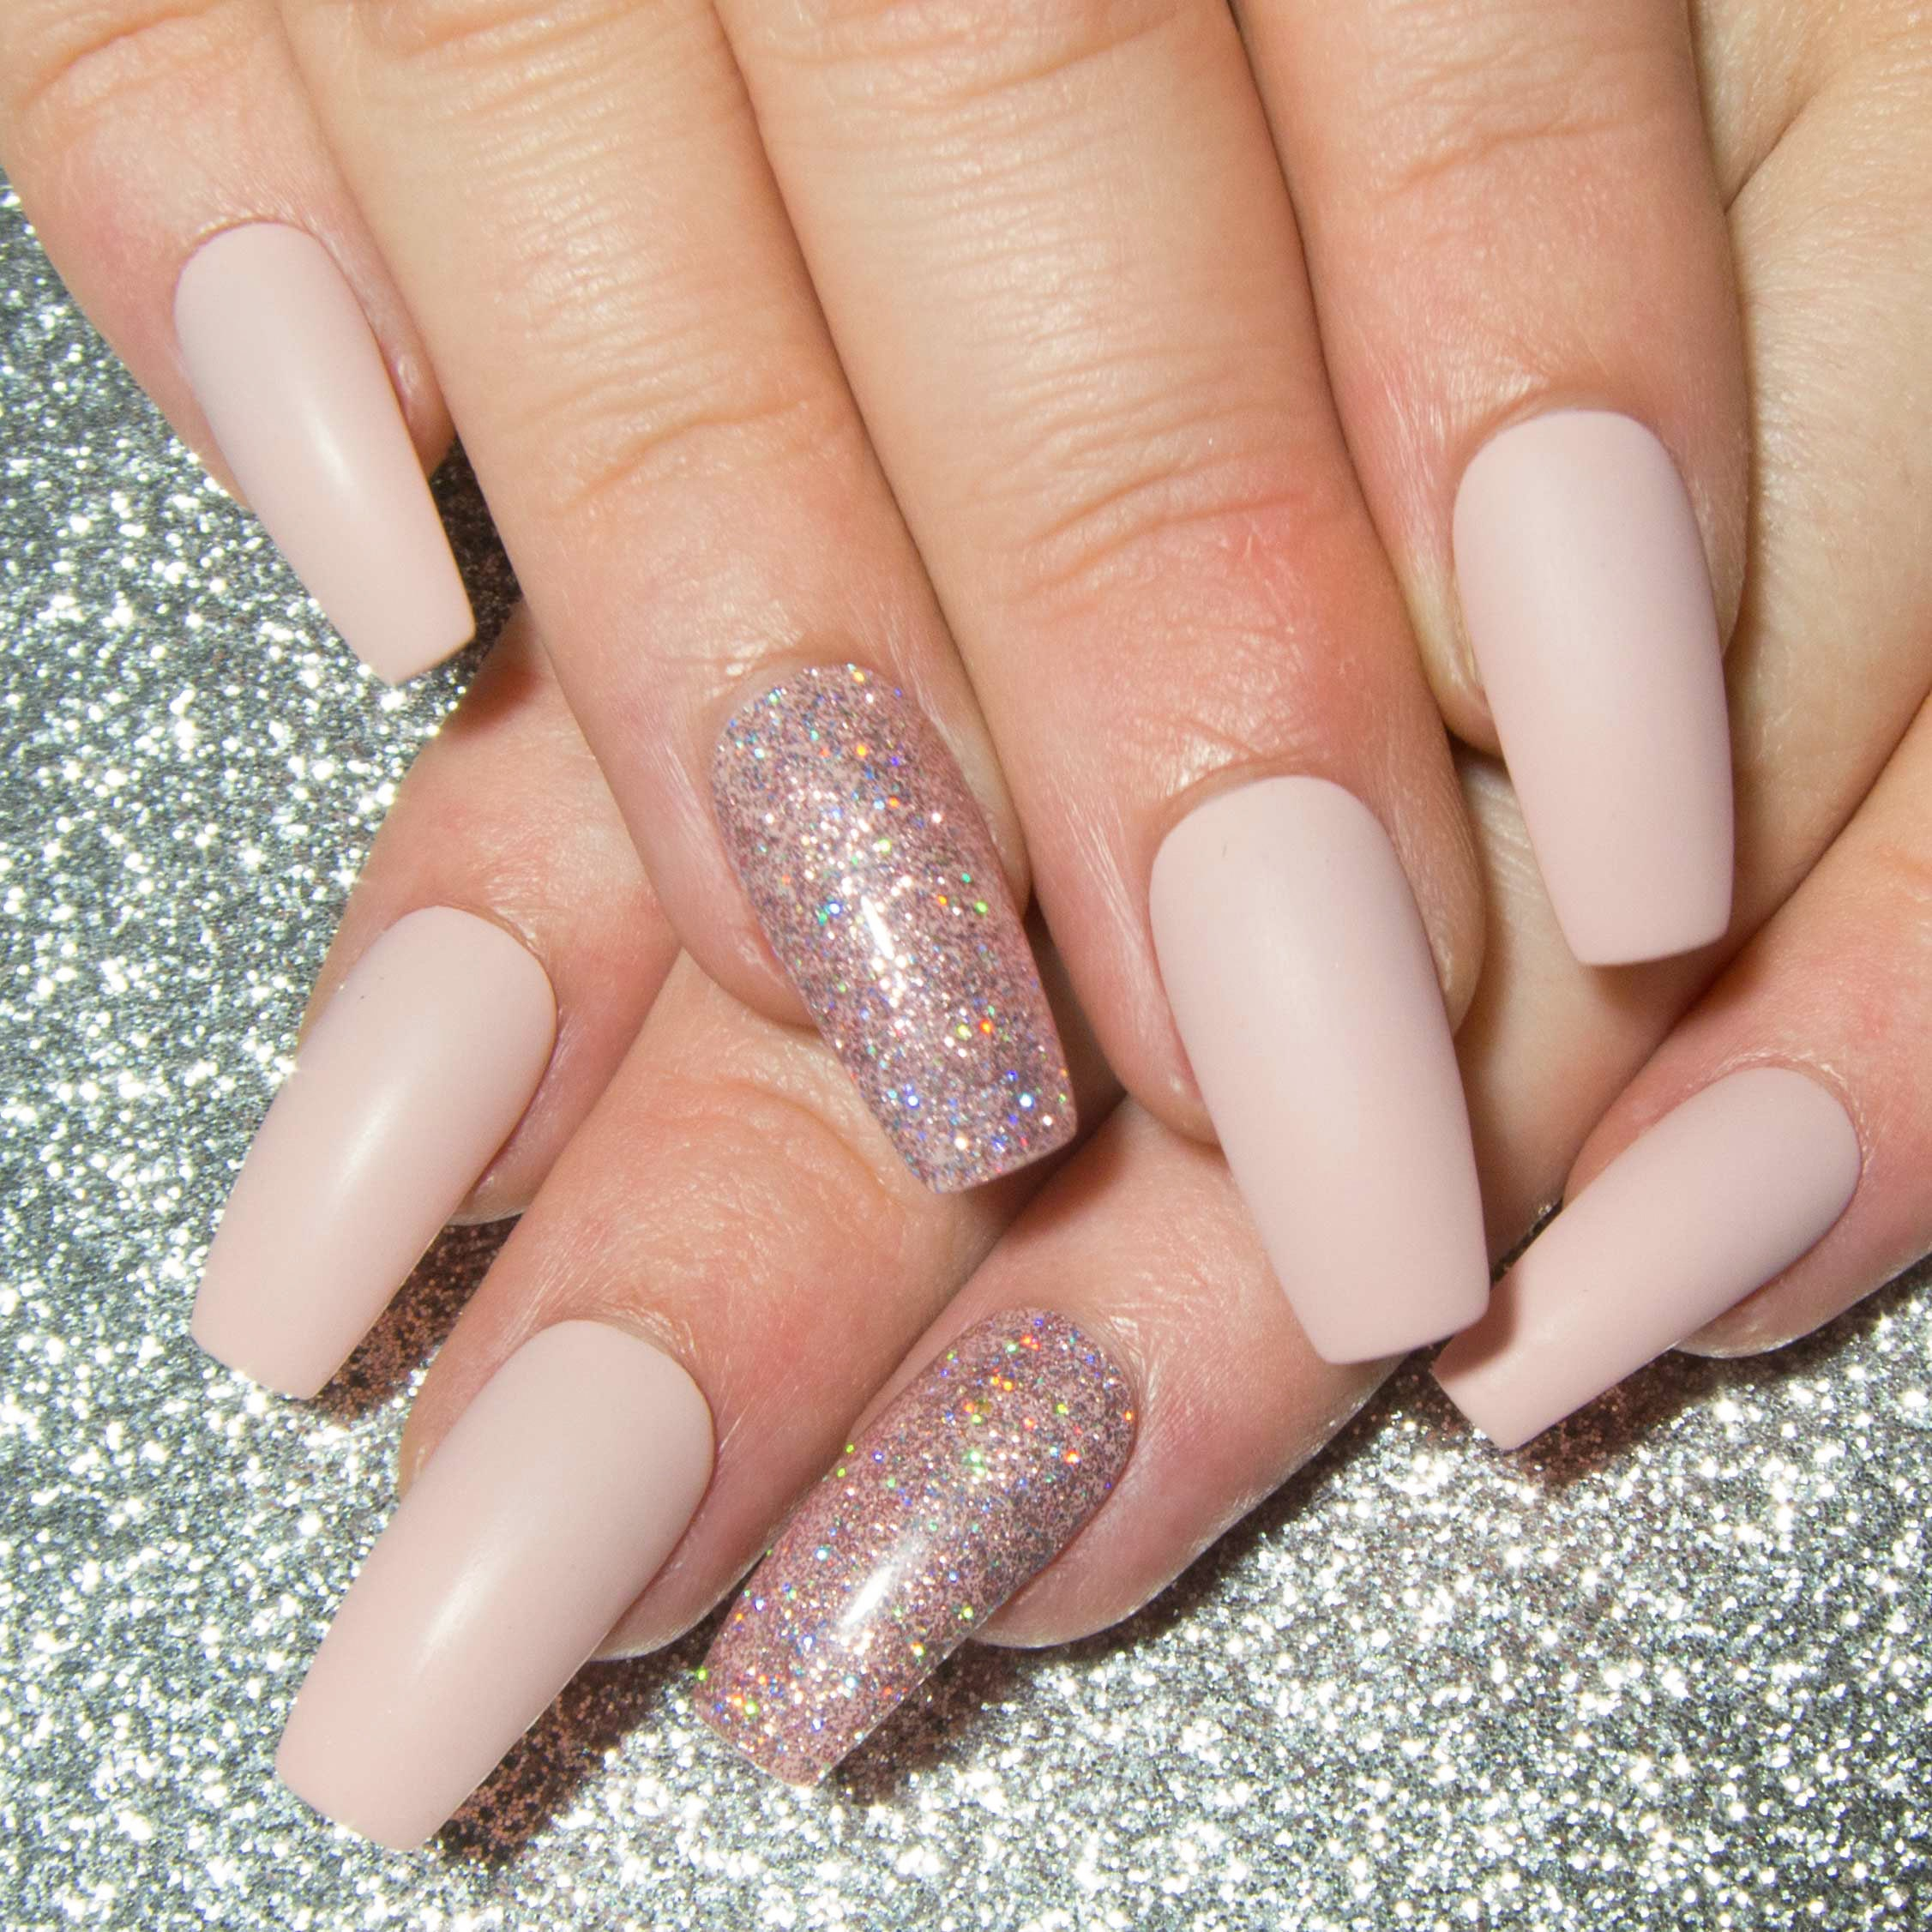 Drücken Sie auf Nägel matt rosa Fake Nägel falsche Nägel